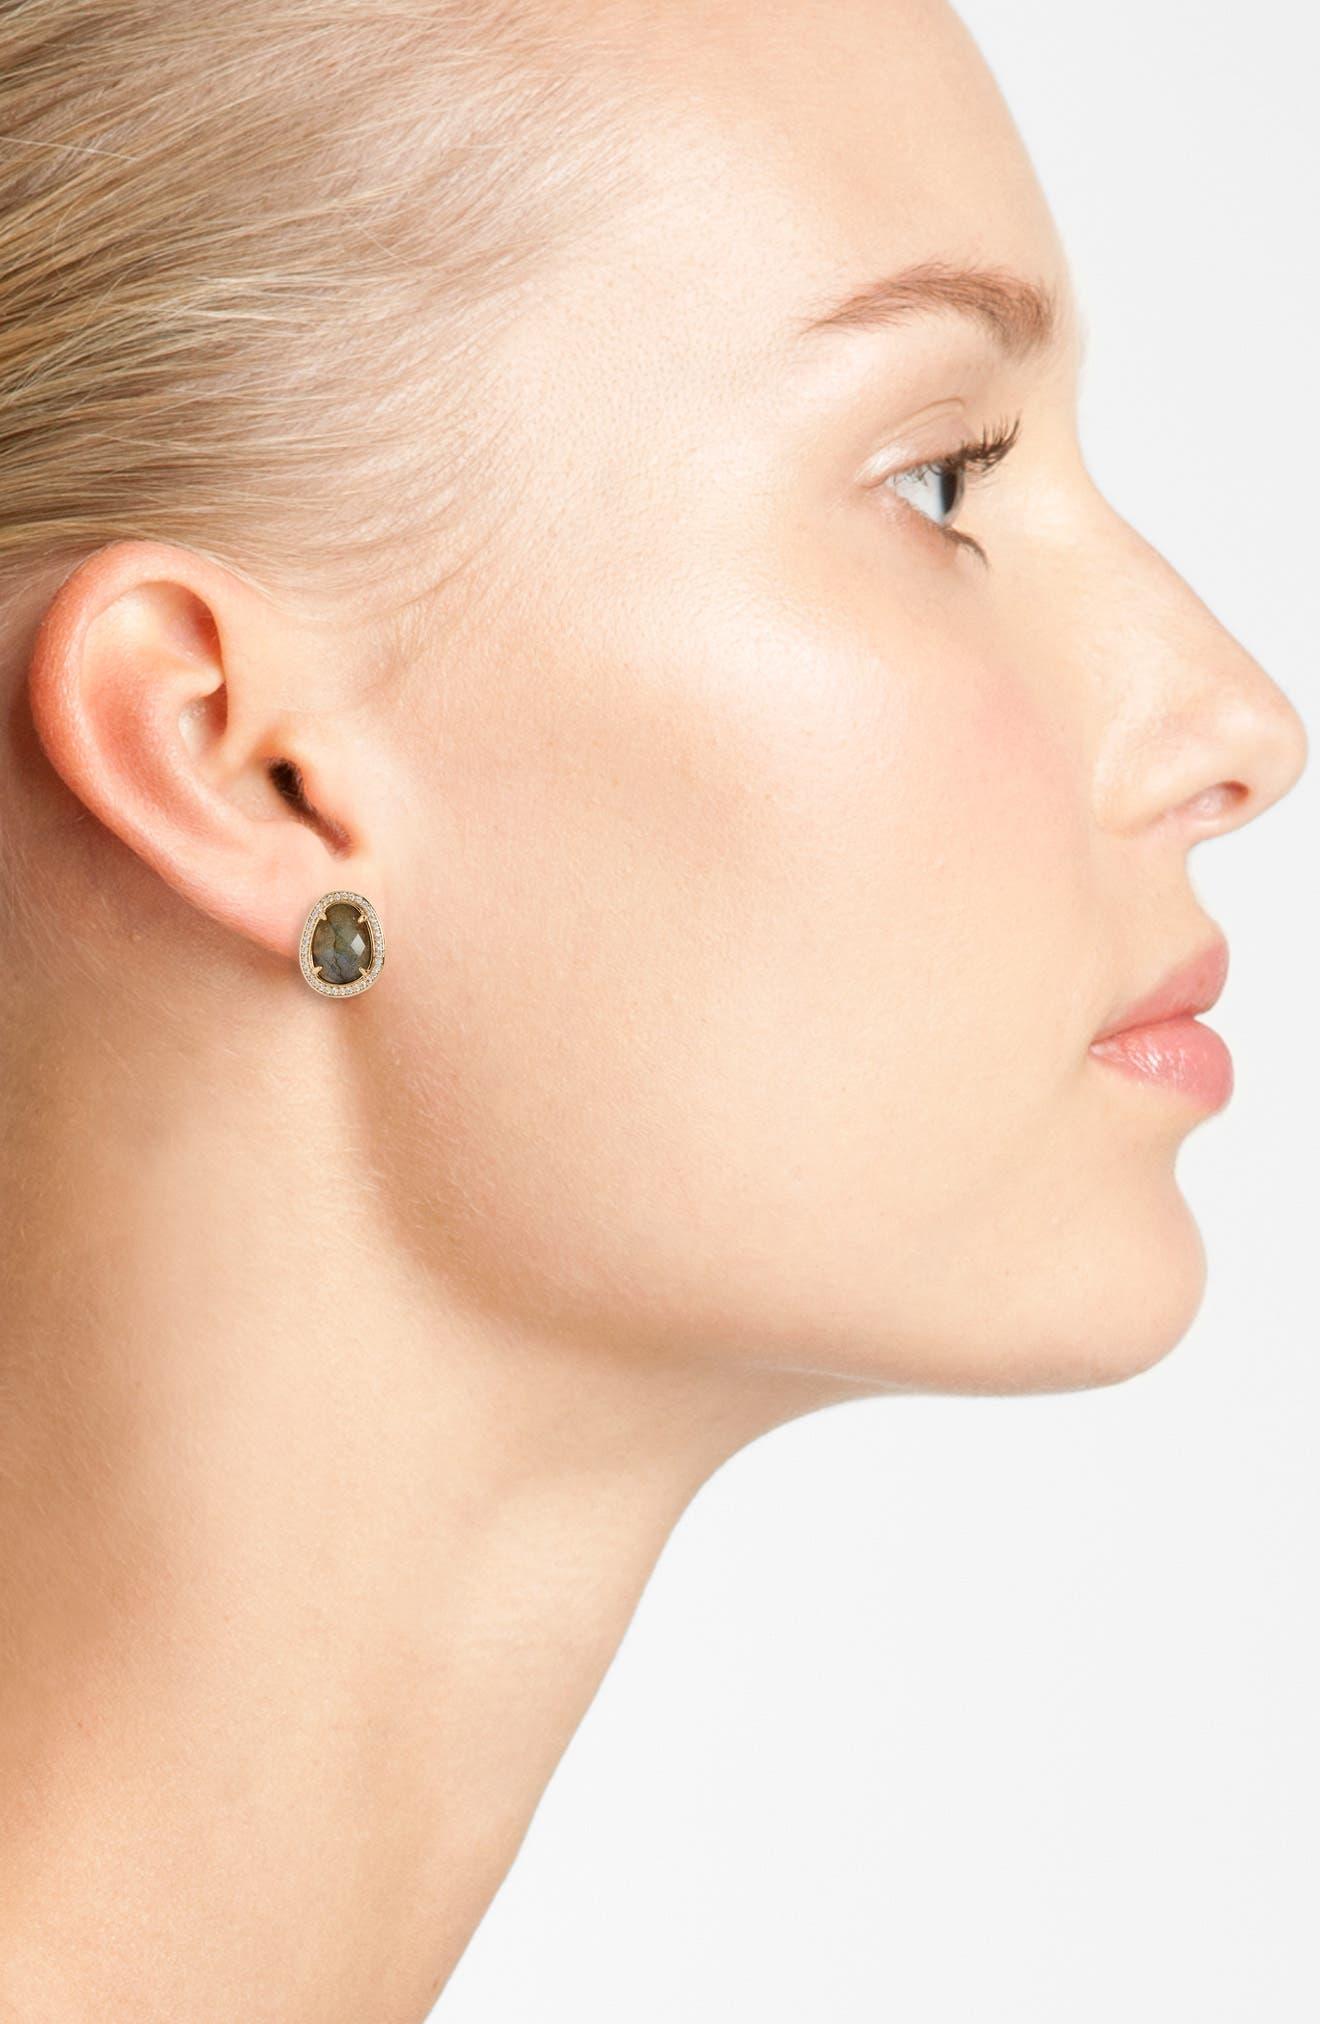 Semiprecious Stone Stud Earrings,                             Alternate thumbnail 2, color,                             Labradorite/ Gold